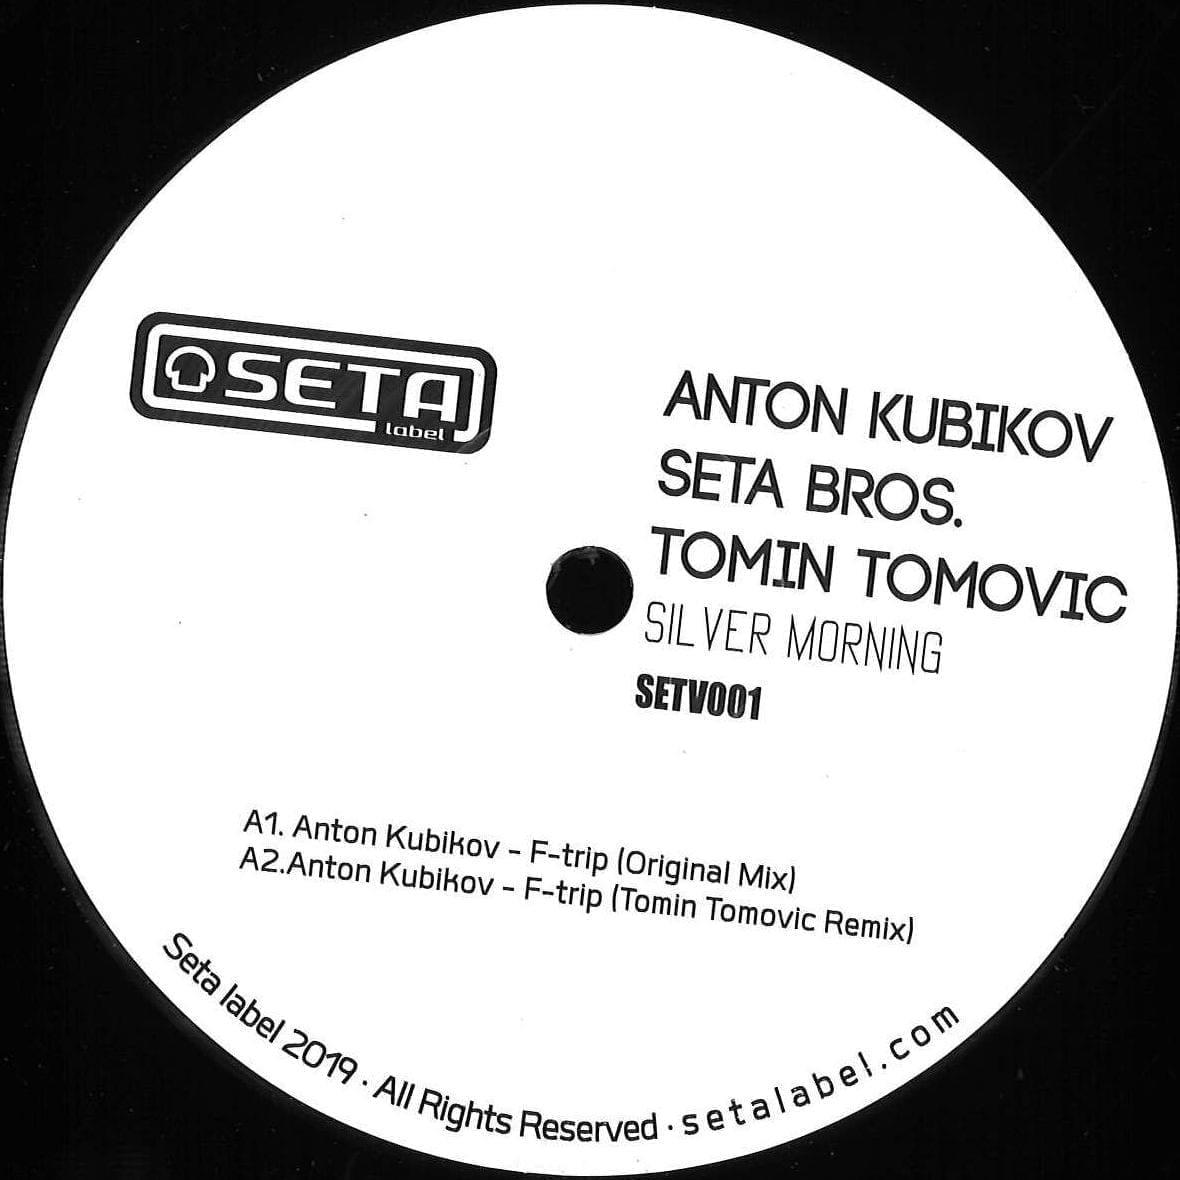 Anton Kubikov Seta Bros - Silver Morning [Seta Label] front